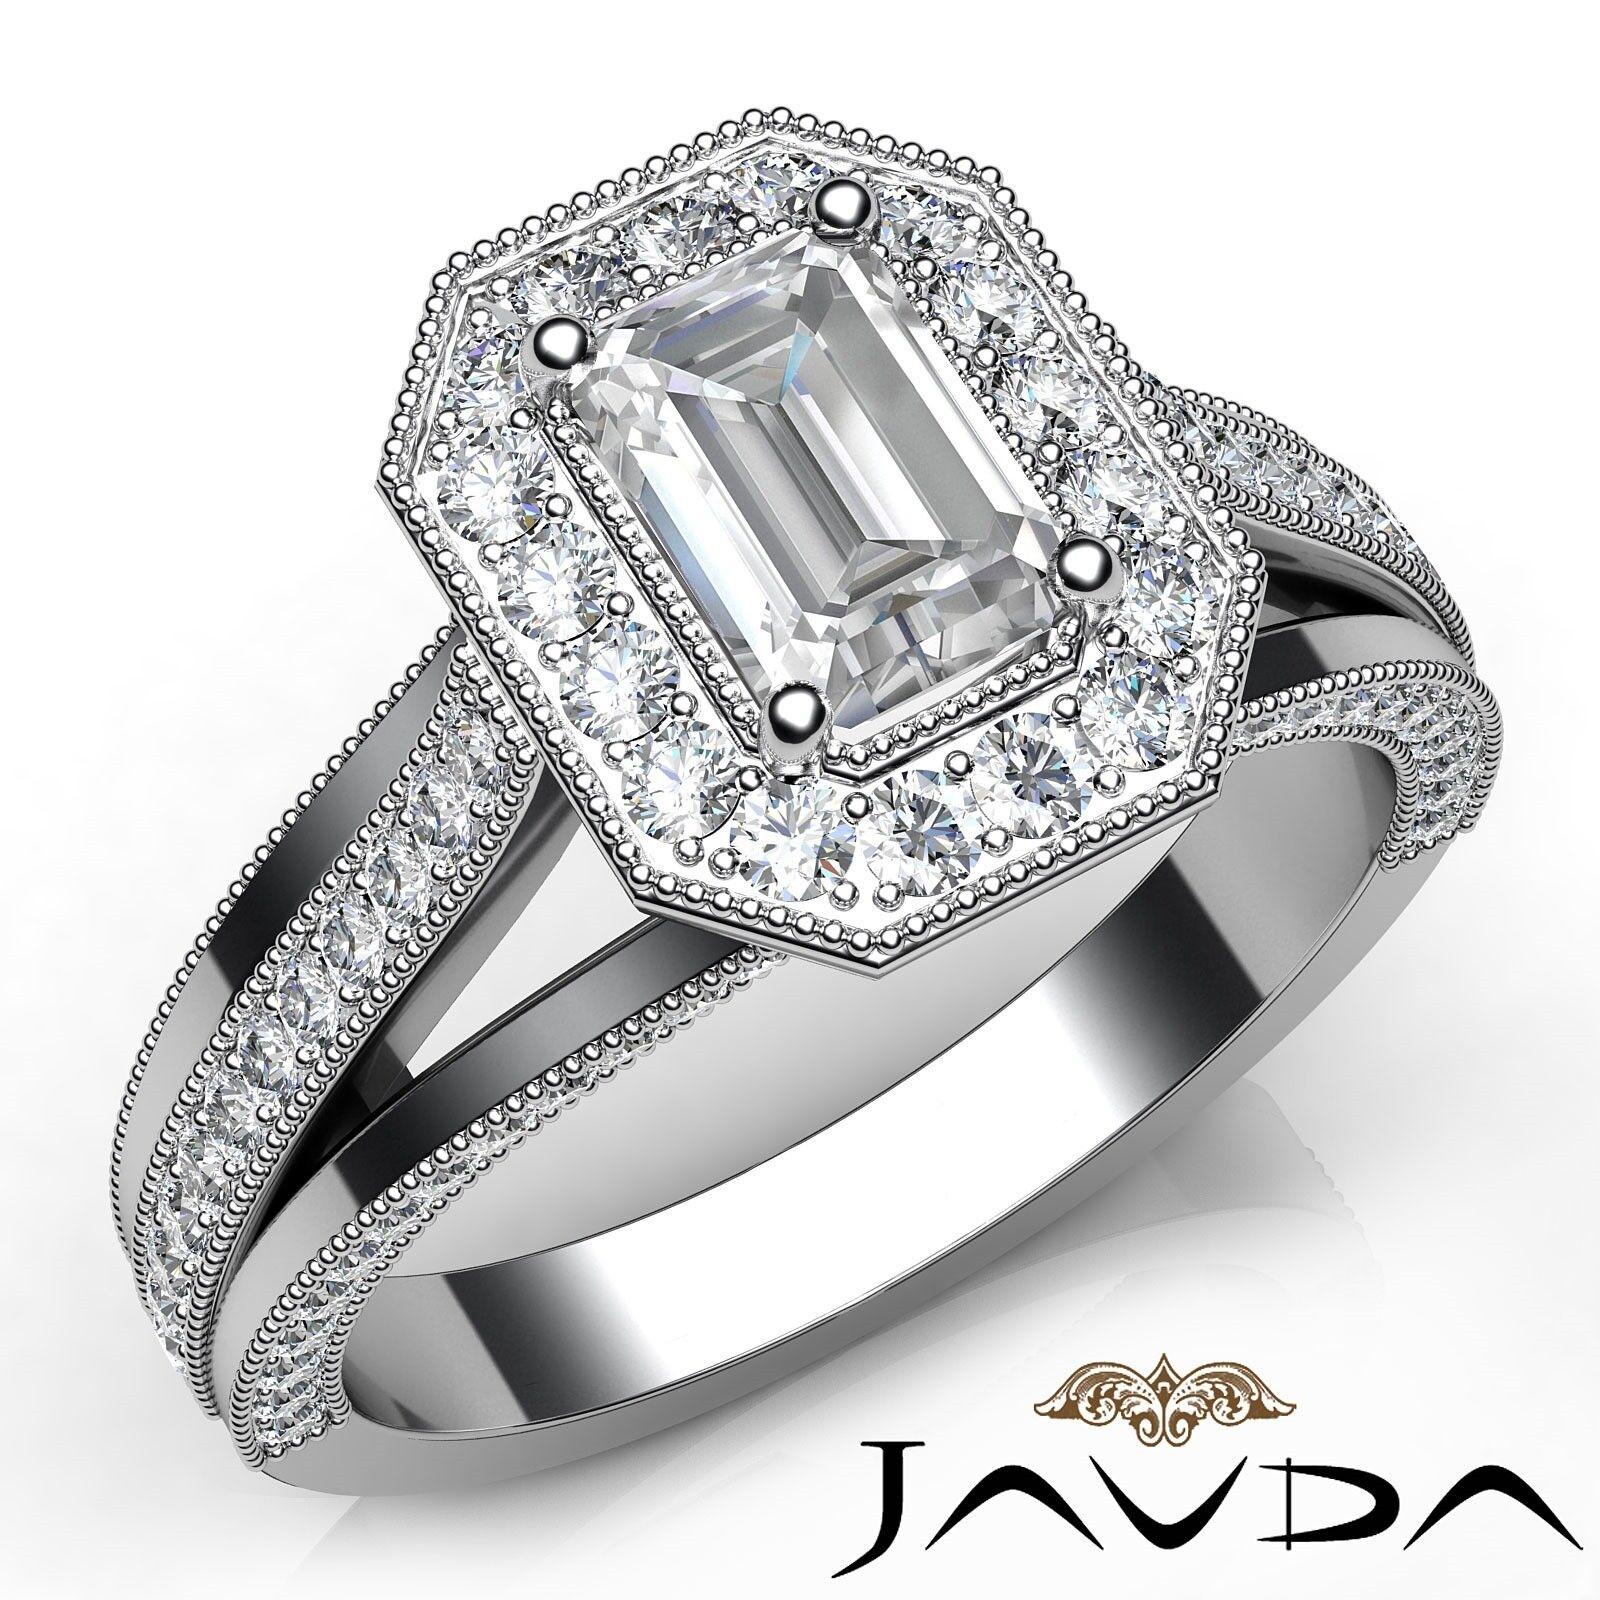 1.63ctw Milgrain Side-Stone Emerald Diamond Engagement Ring GIA H-SI1 White Gold